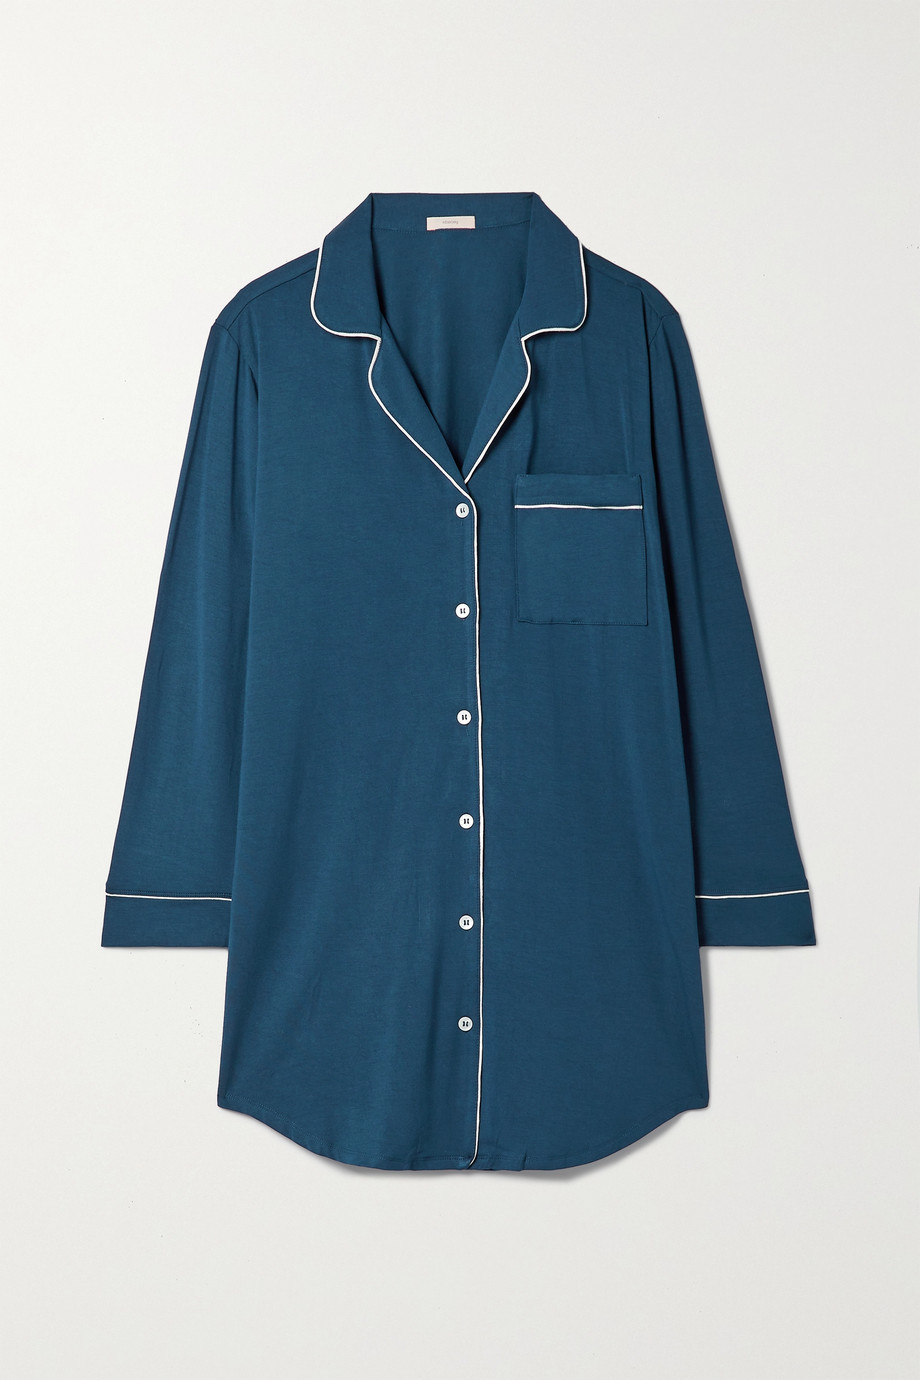 Eberjey Gisele Nachthemd aus Stretch-Modal